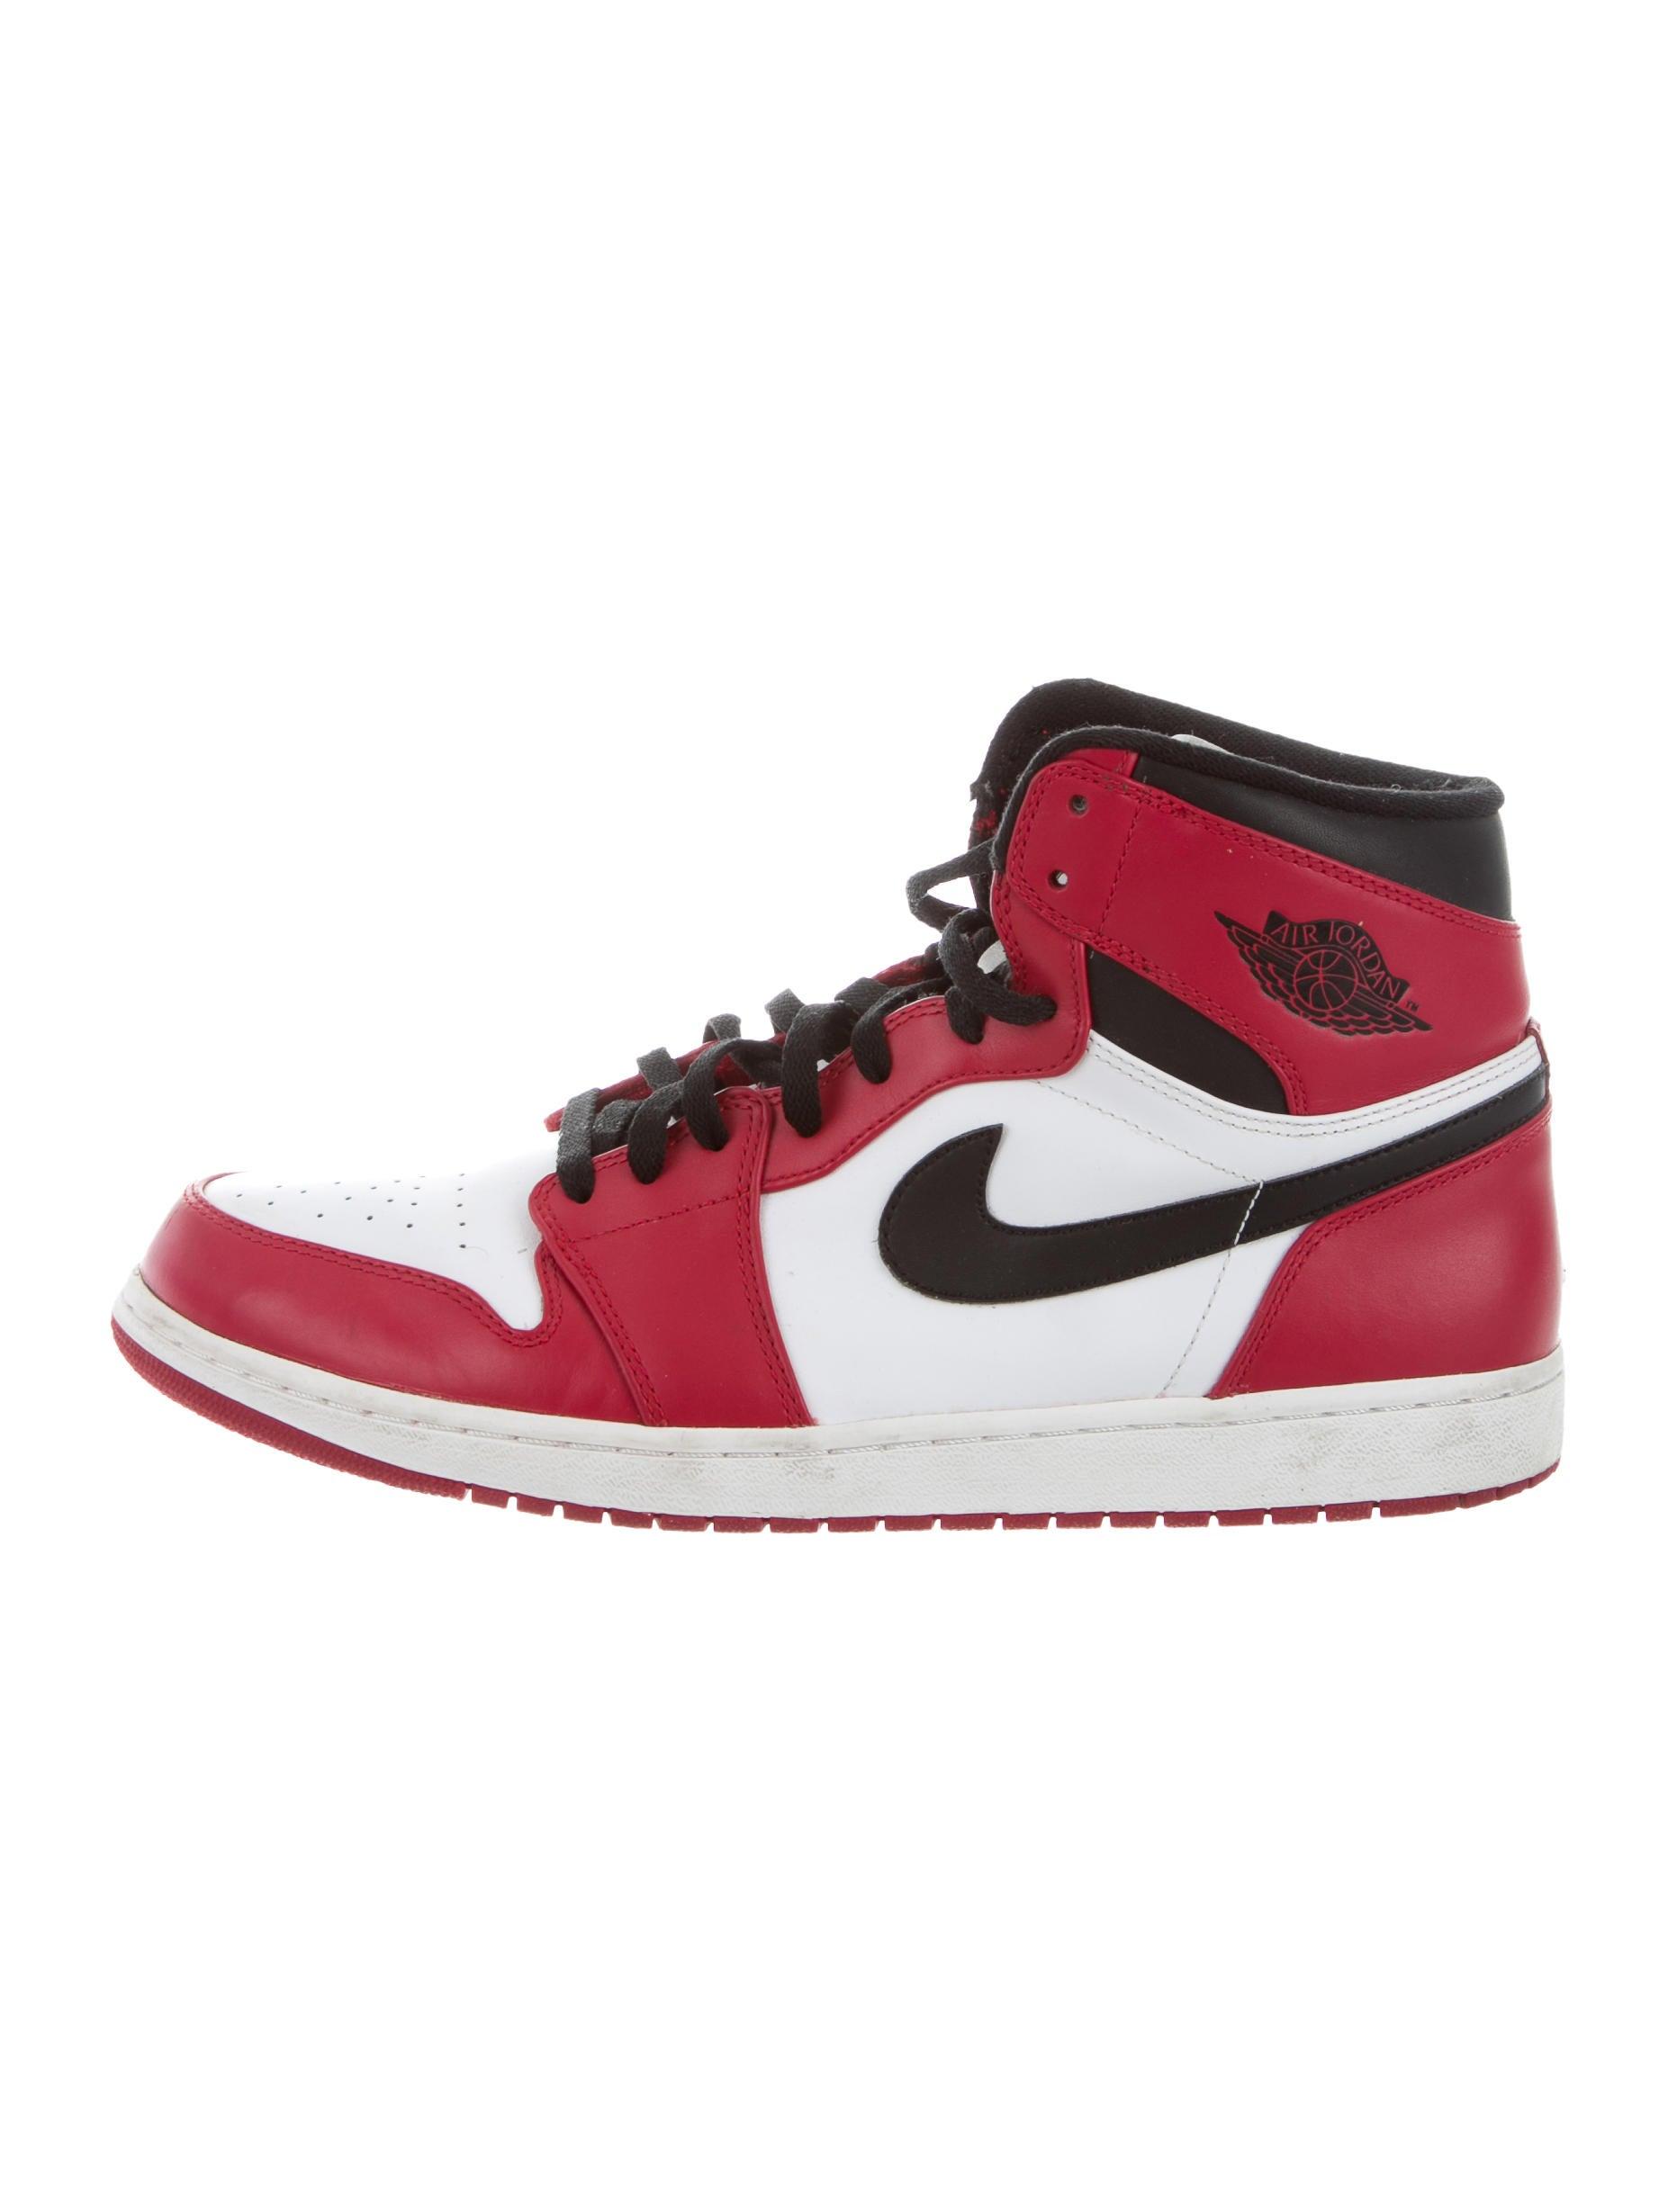 Nike Scuffs Shoes